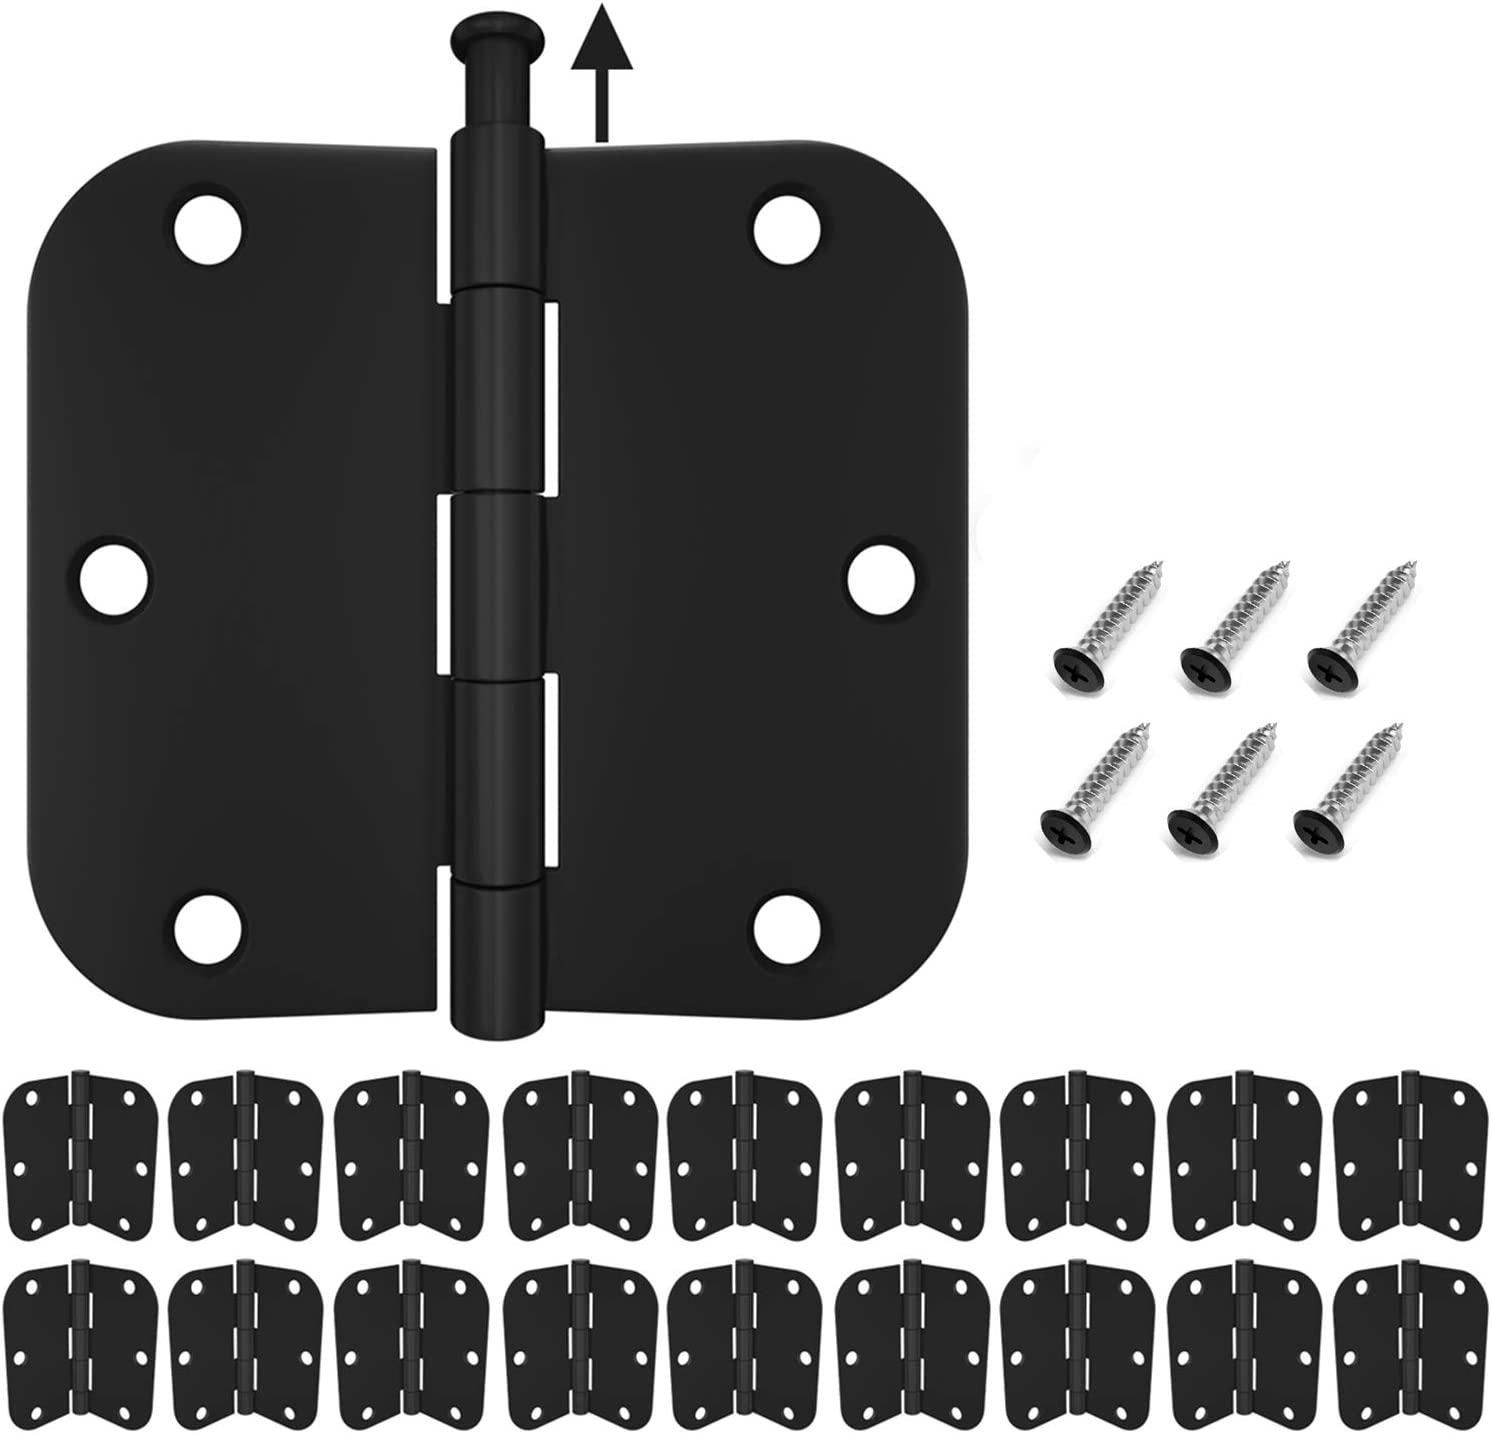 HOSOM 18-Pack Door Hinges Matte Black 3.5, Hinges for Interior Doors with 5/8 Radius Corners